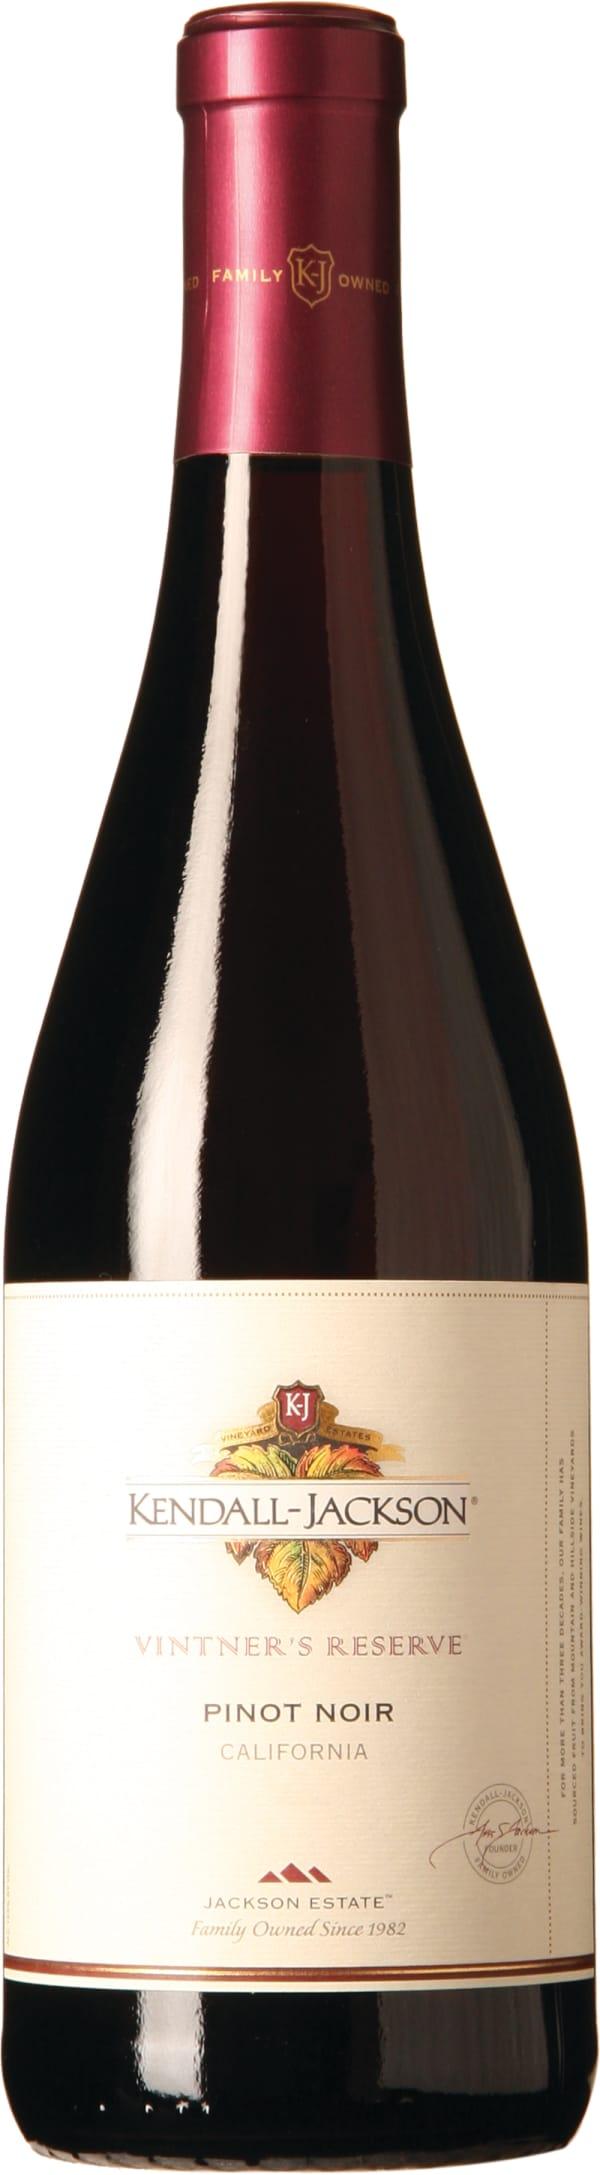 Kendall Jackson Vintners Reserve Pinot Noir 2016